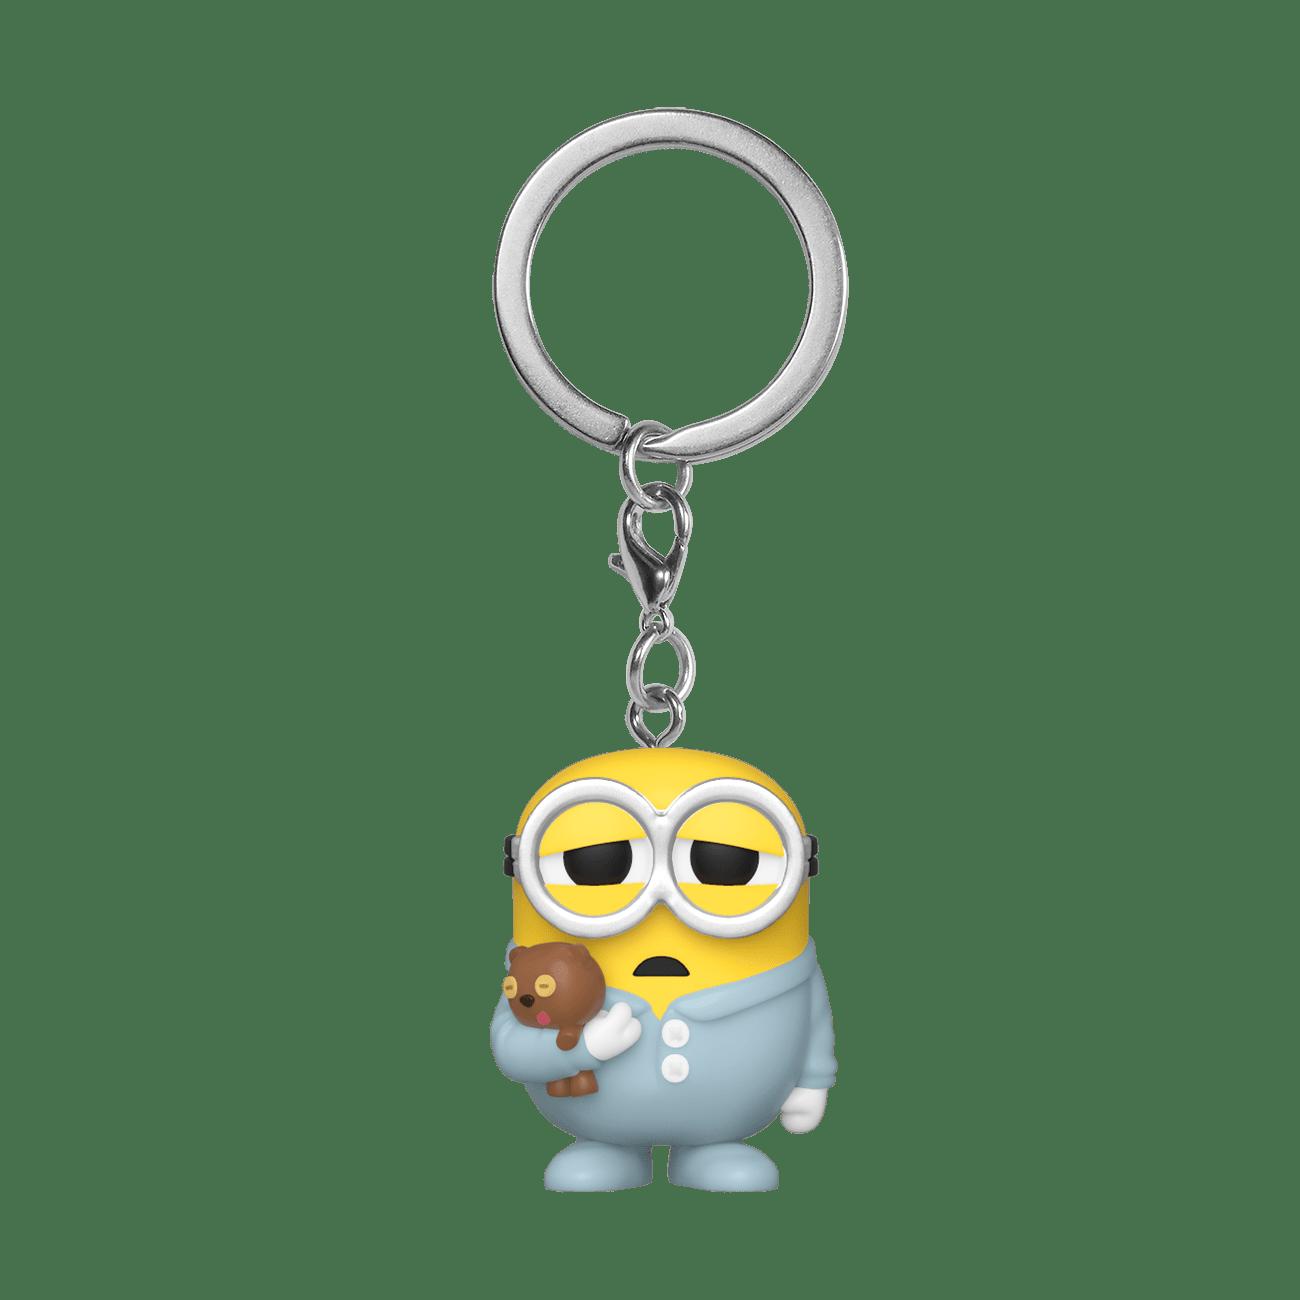 47796_Minions2_PajamaBob_POPKeychain